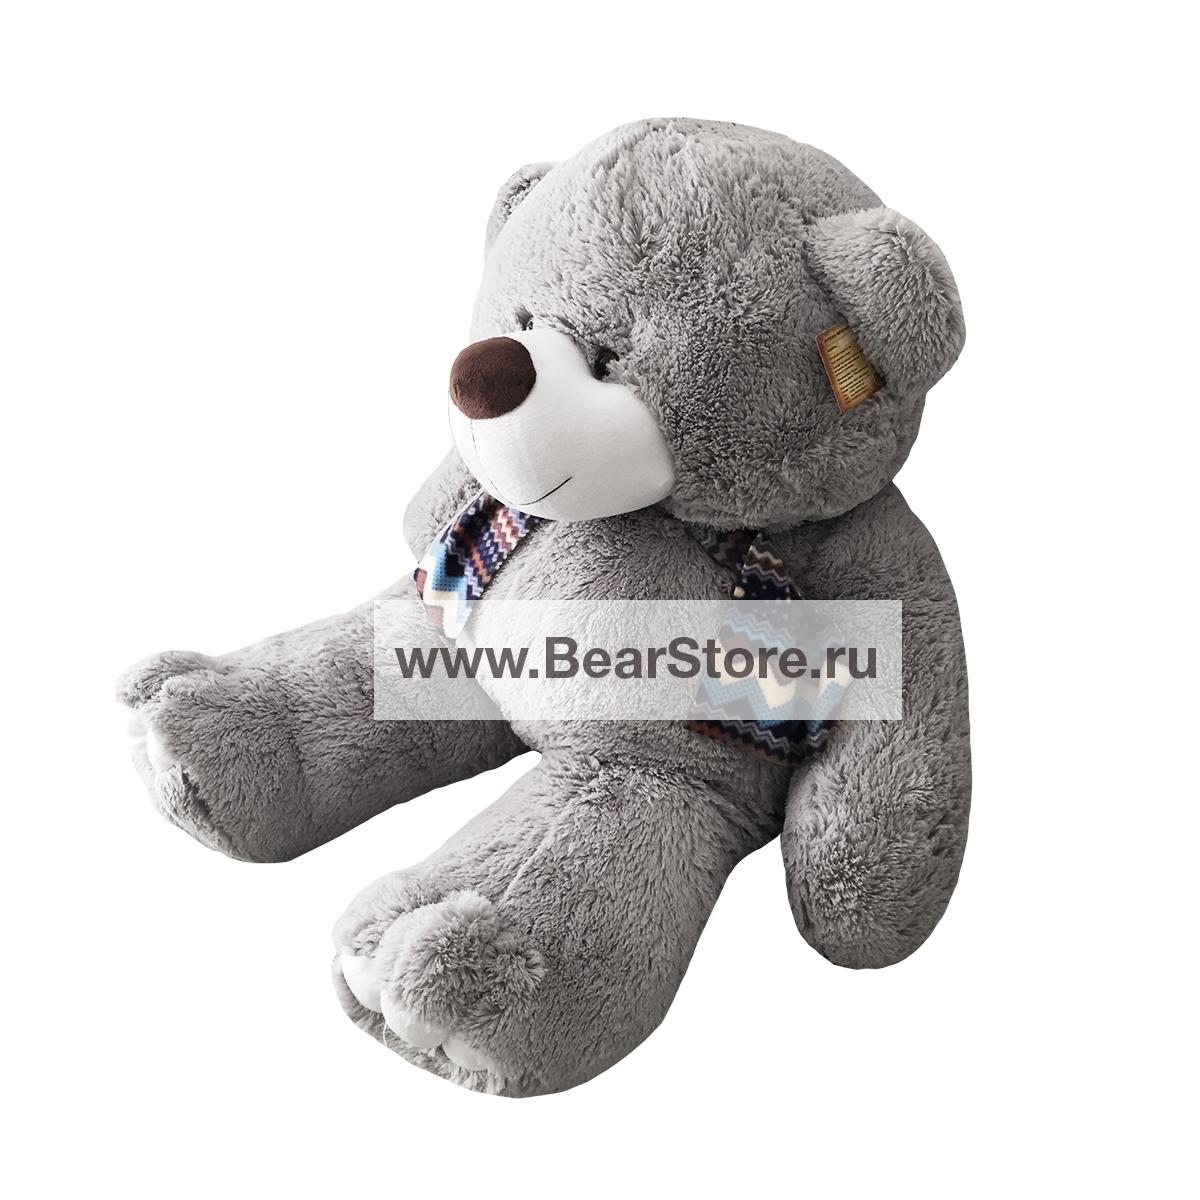 Медведь Семен 110 см